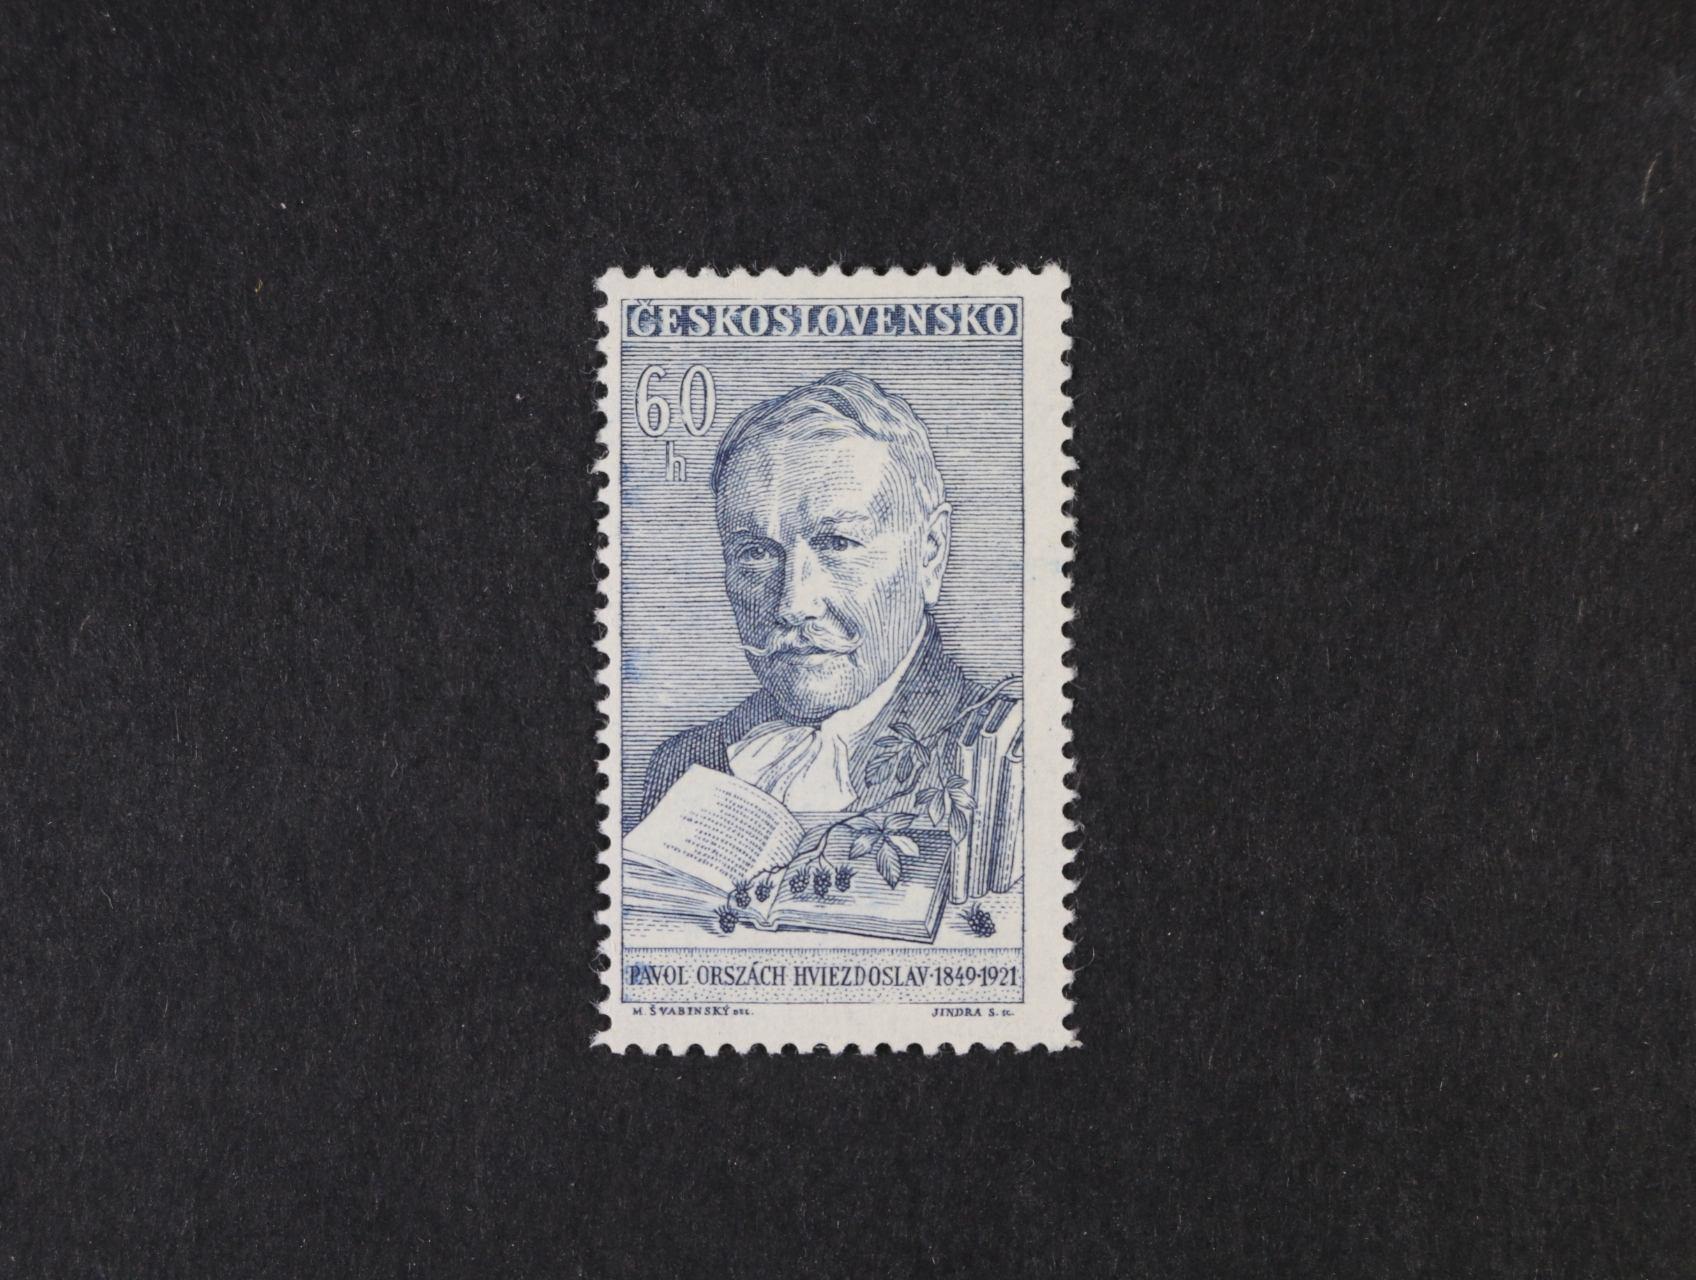 zn. č. 1174, typ II, zk. Kulka, kat. cena 3200 Kč